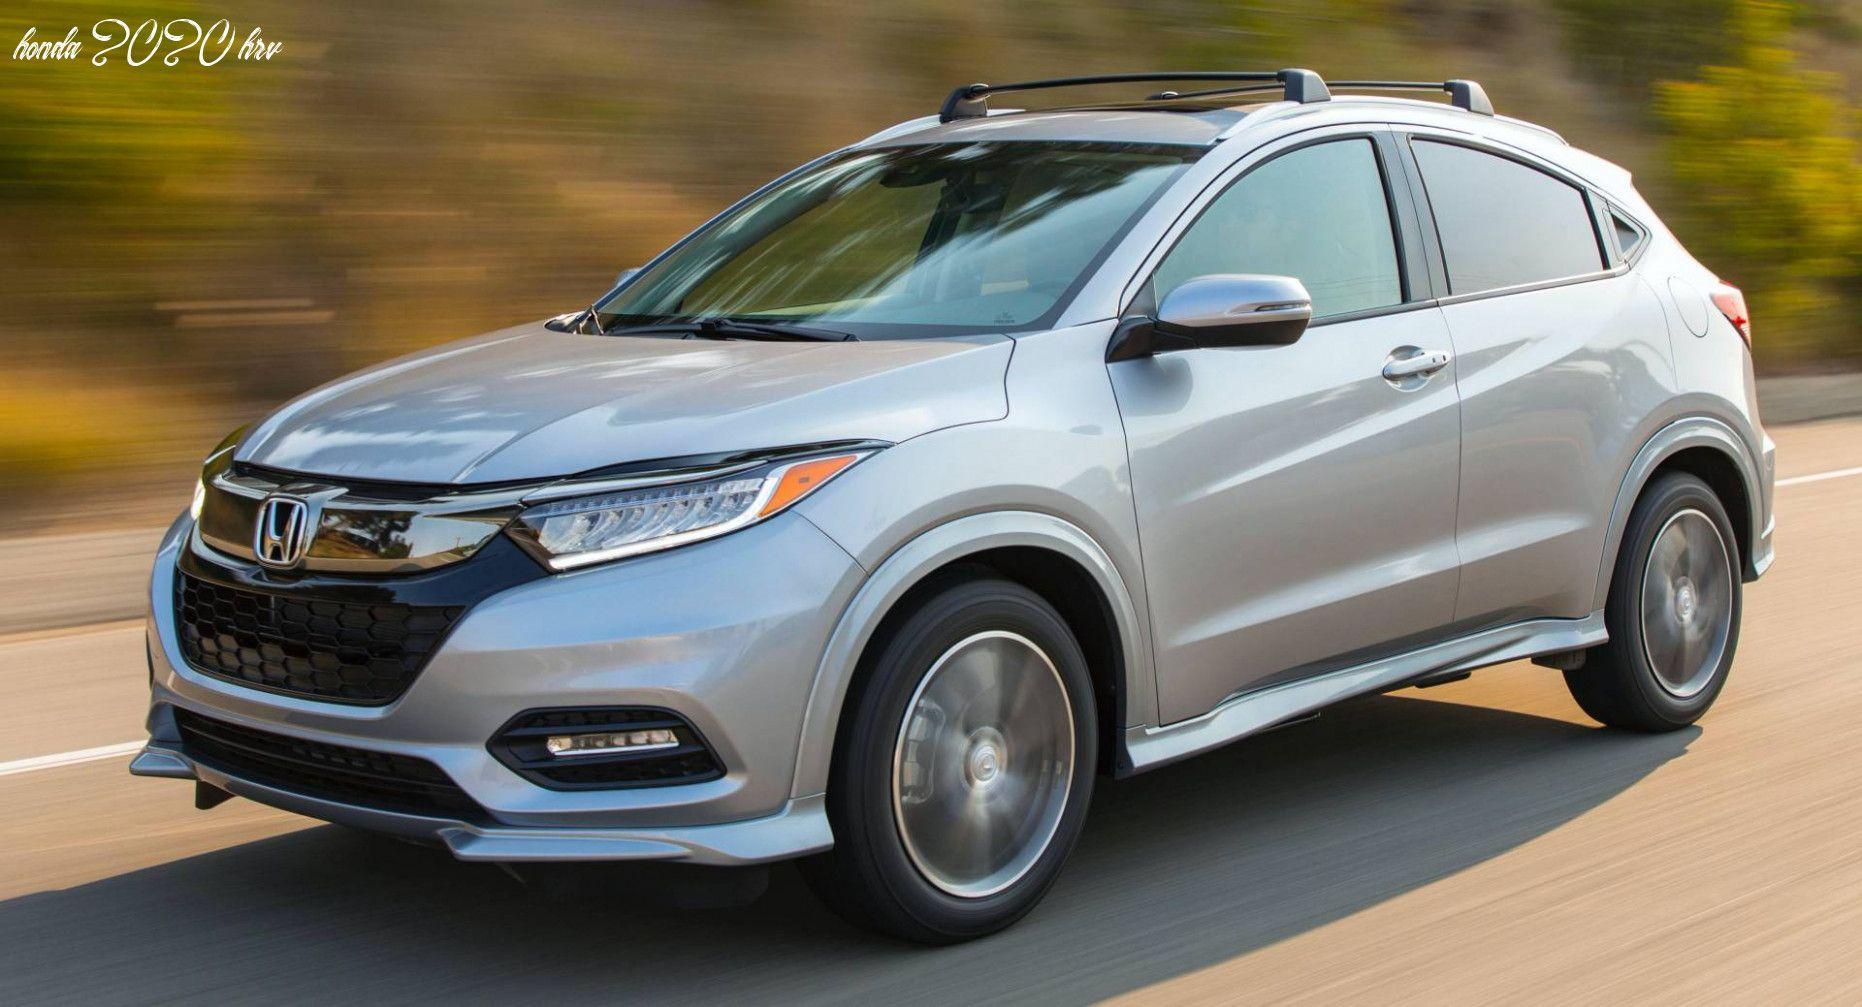 Honda 2020 Hrv in 2020 Honda, Honda hrv, Suv